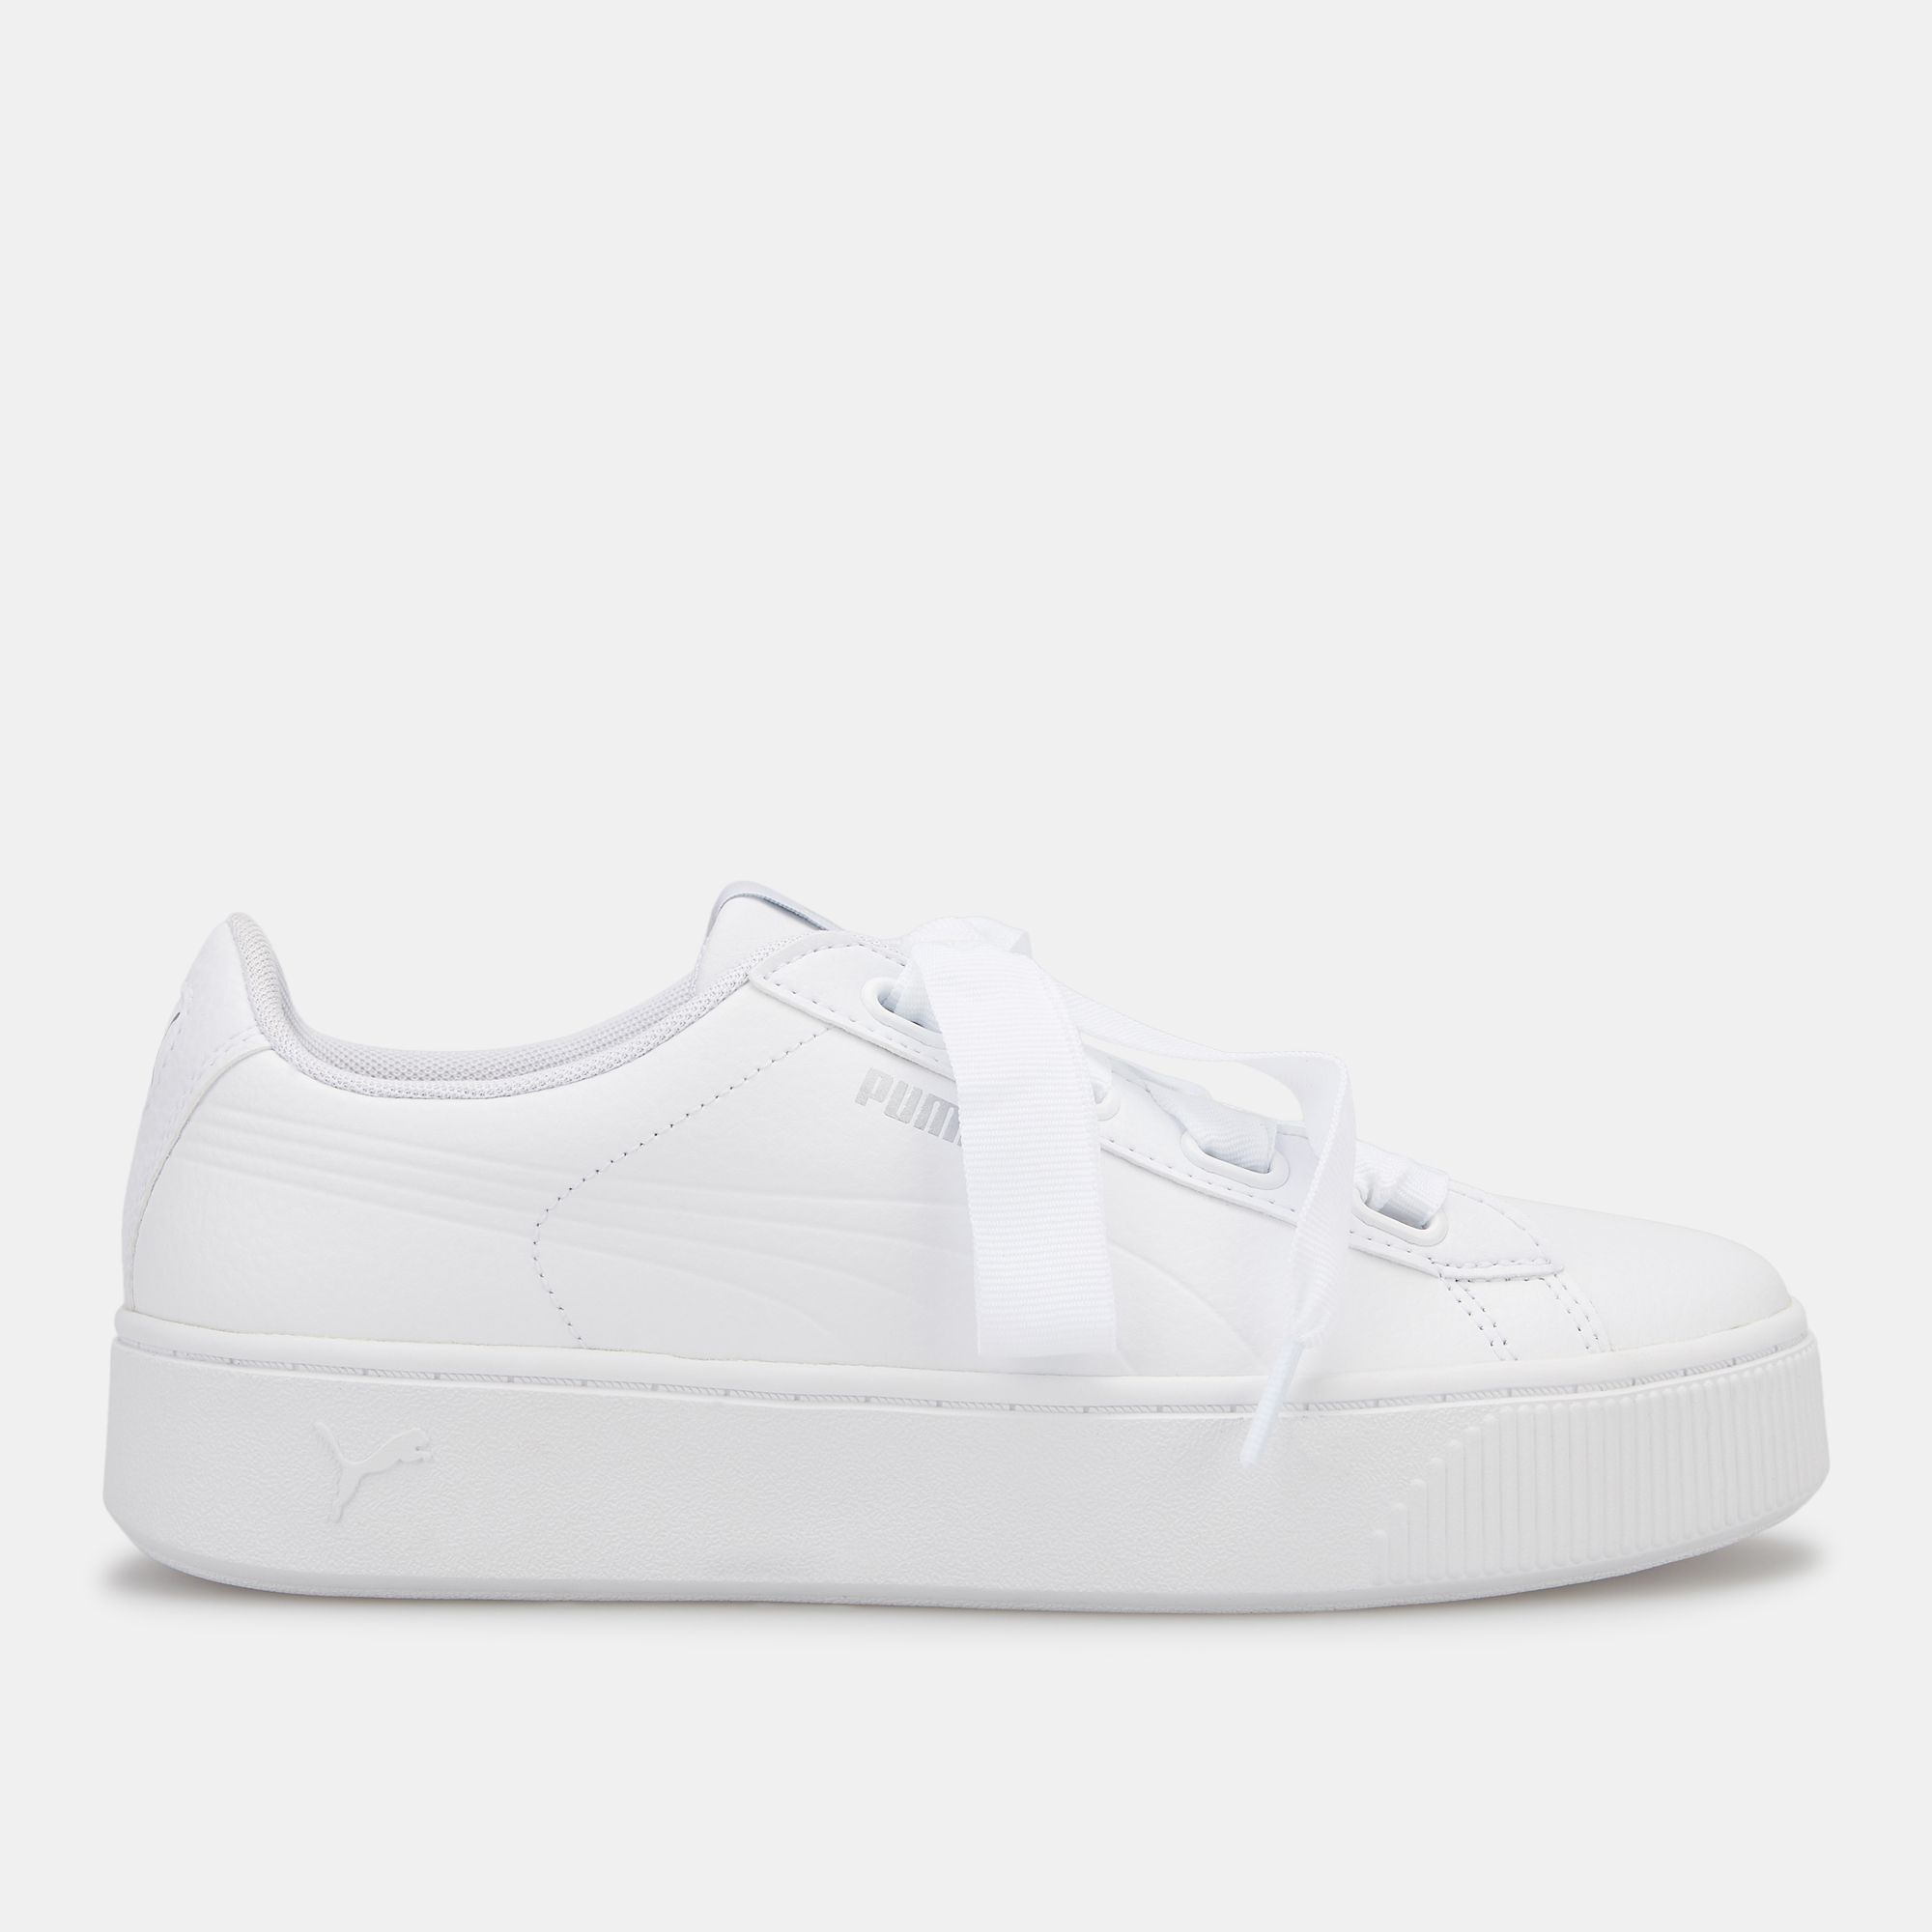 867c719d6 PUMA Women's Vikky Stacked Ribbon Core Shoe   Sneakers   Shoes ...